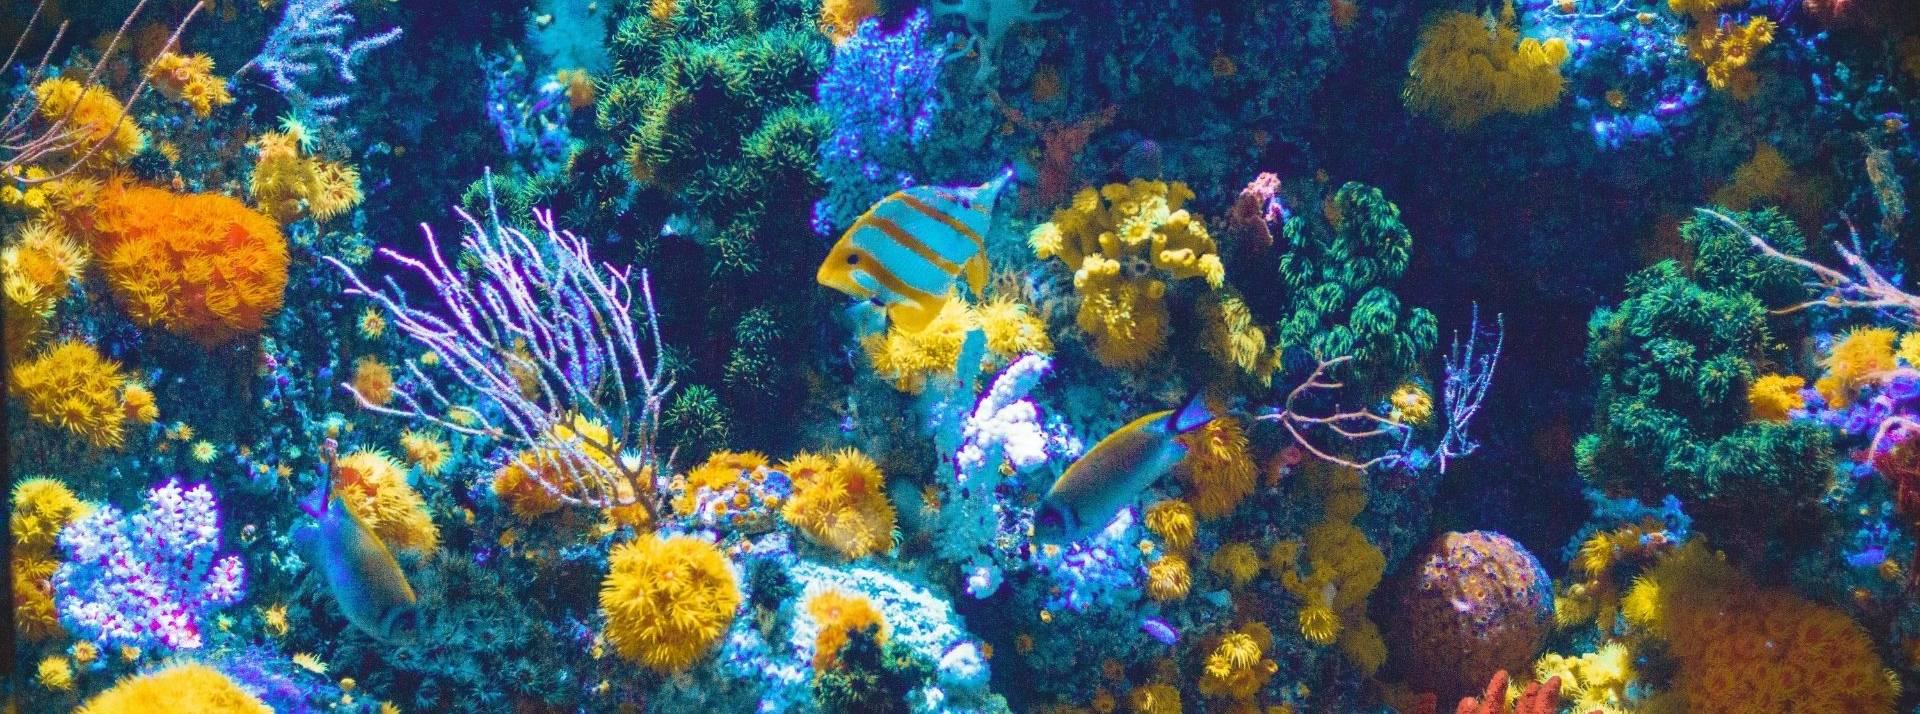 coraux, poissons, océan